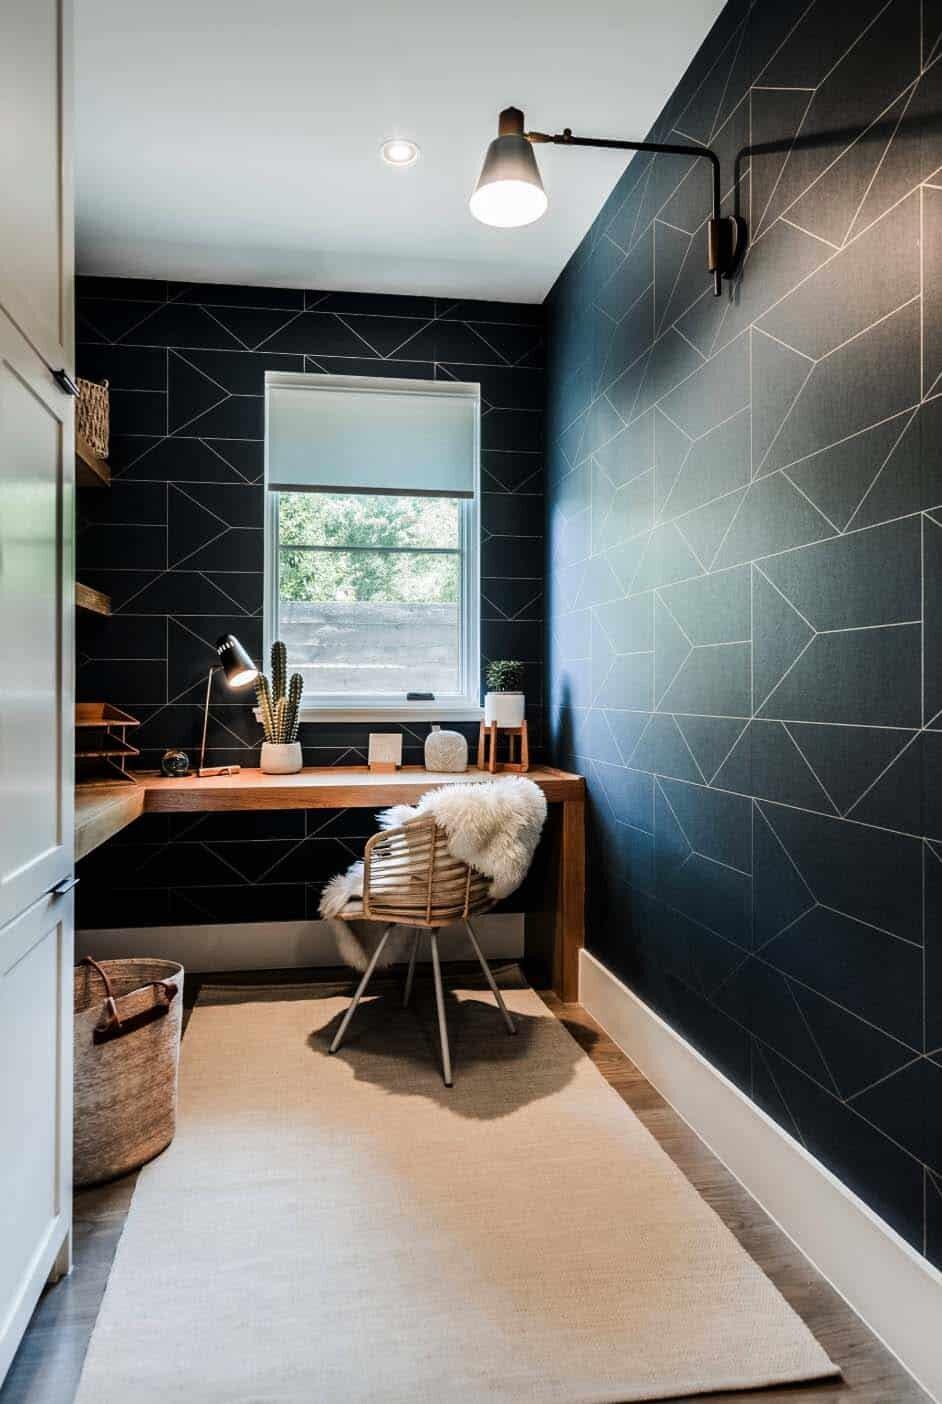 Organic-Modern-Style-Home-Urbanology-Designs-20-1-Kindesign.jpg